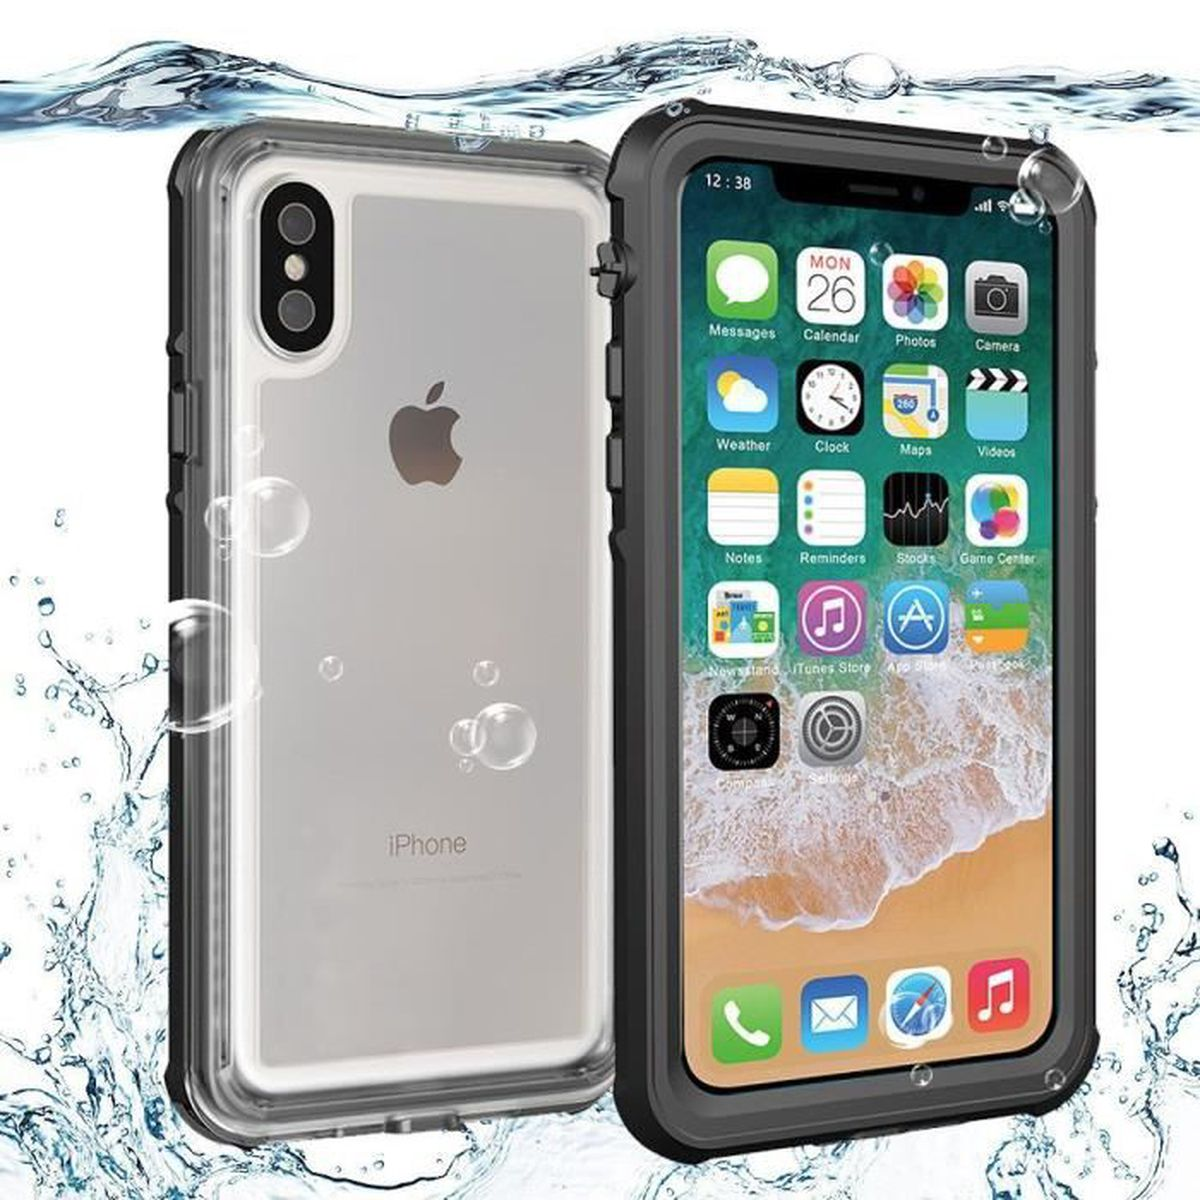 juce r coque etanche iphone x impermeable ip68 ho